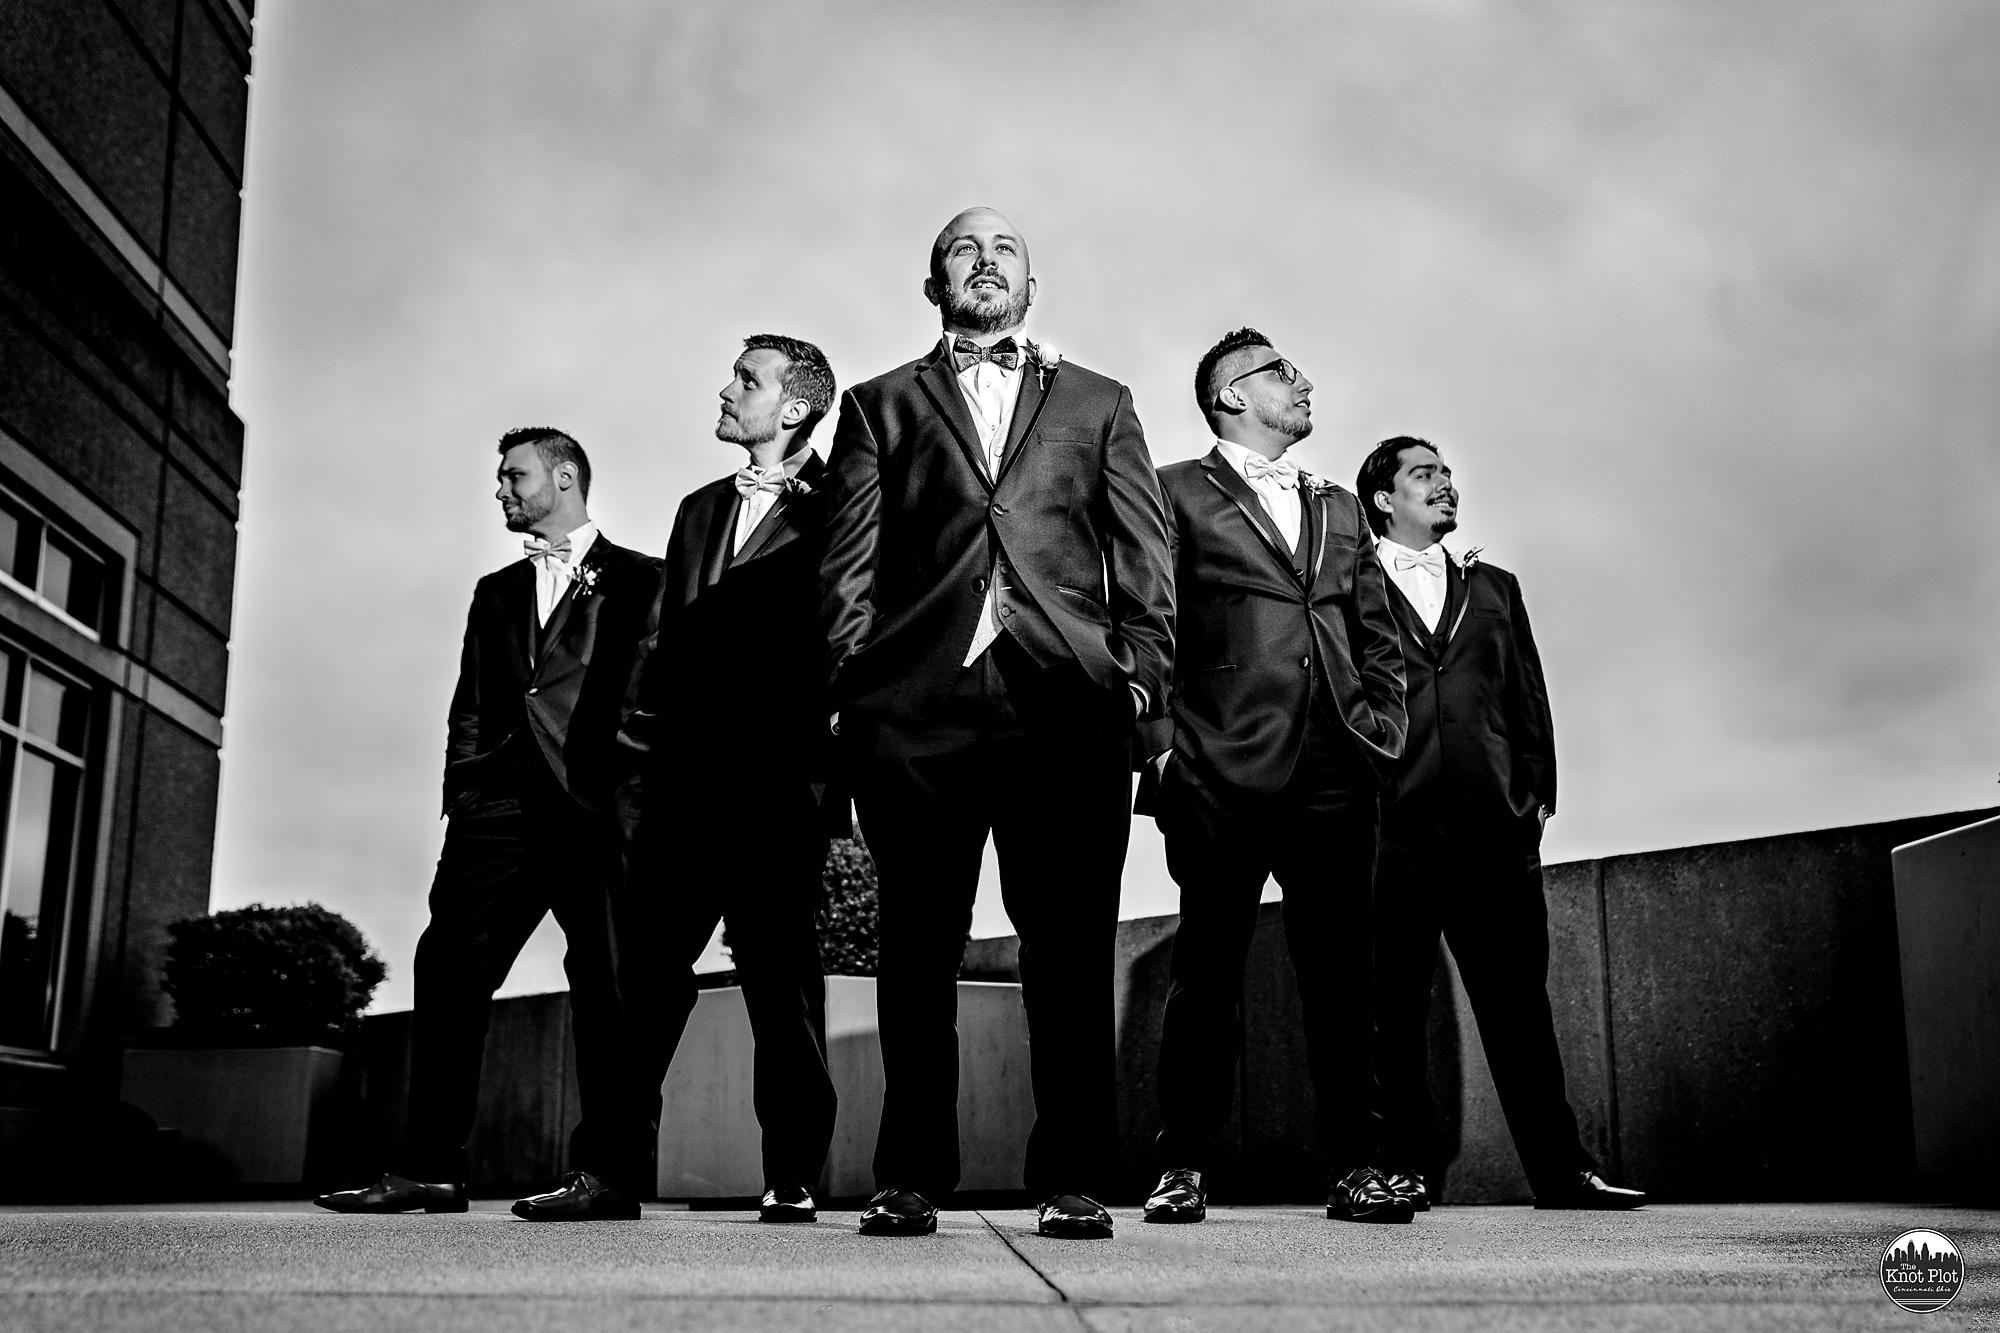 Embassy-Suites-Rivercenter-Cincinnati-Wedding-Photography-11.jpg